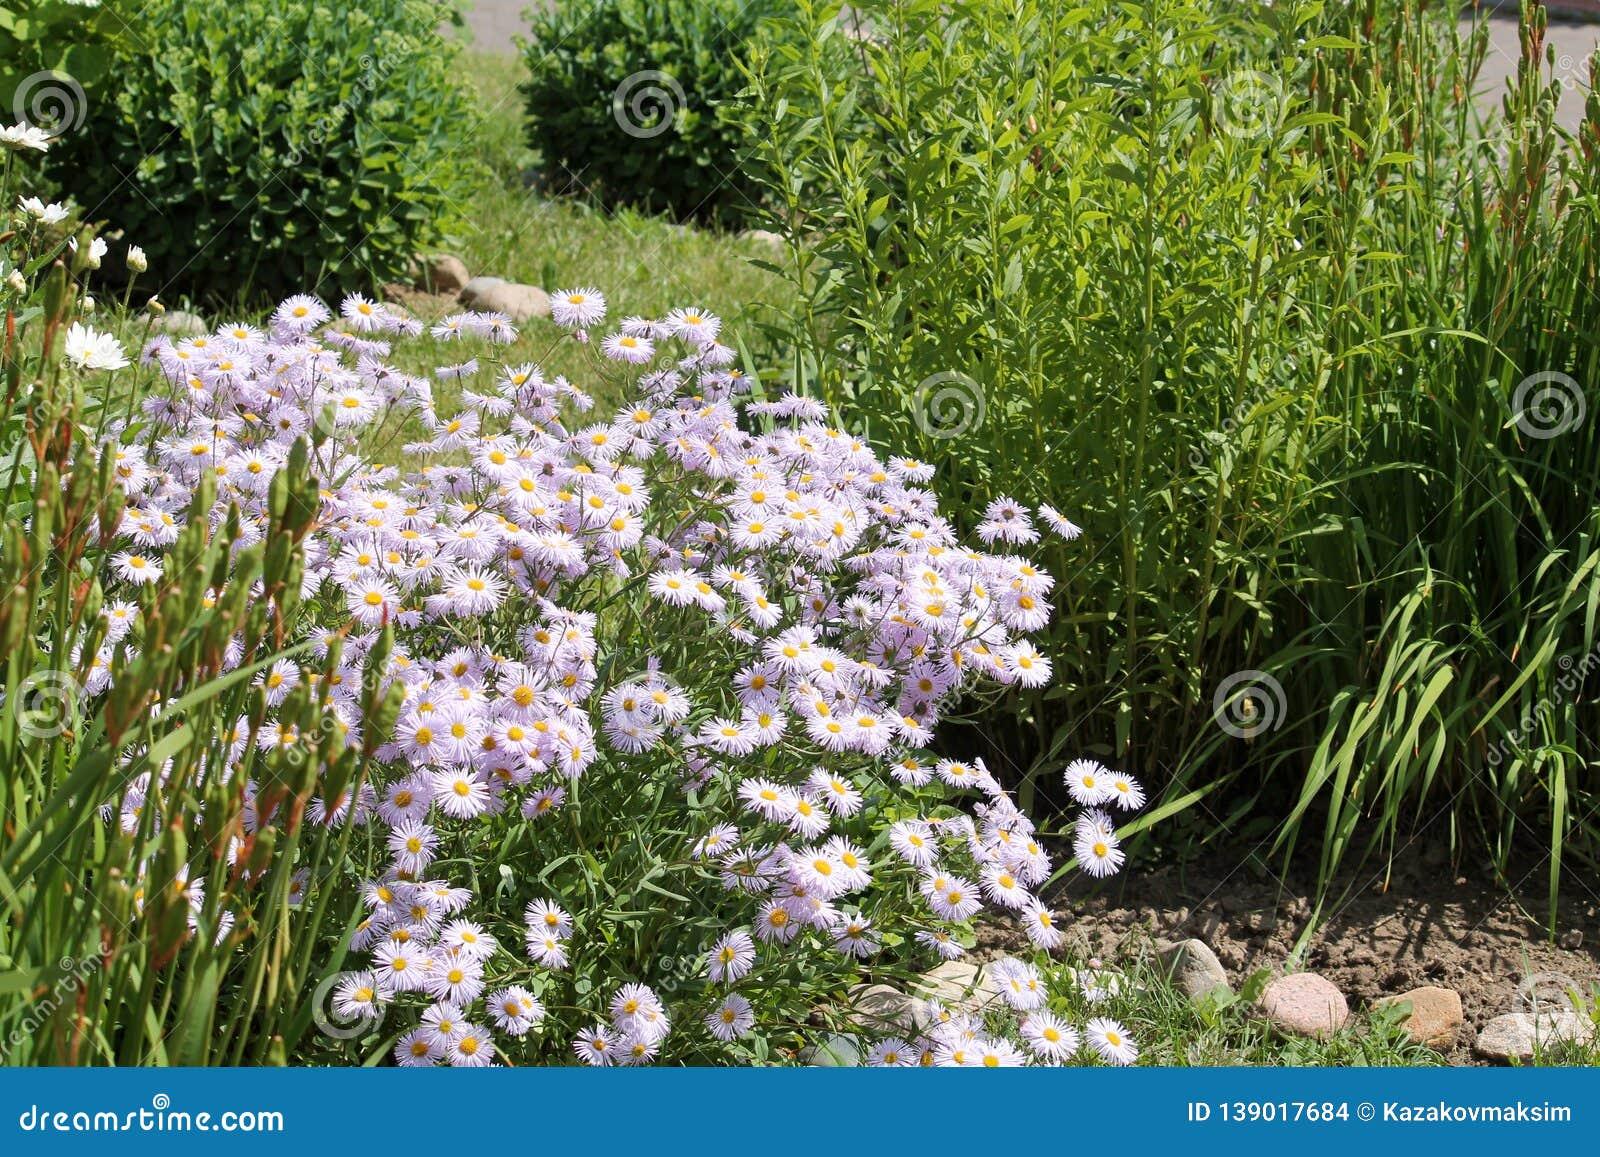 flowers of symphyotrichum novae-angliae syn. aster novae-angliae or